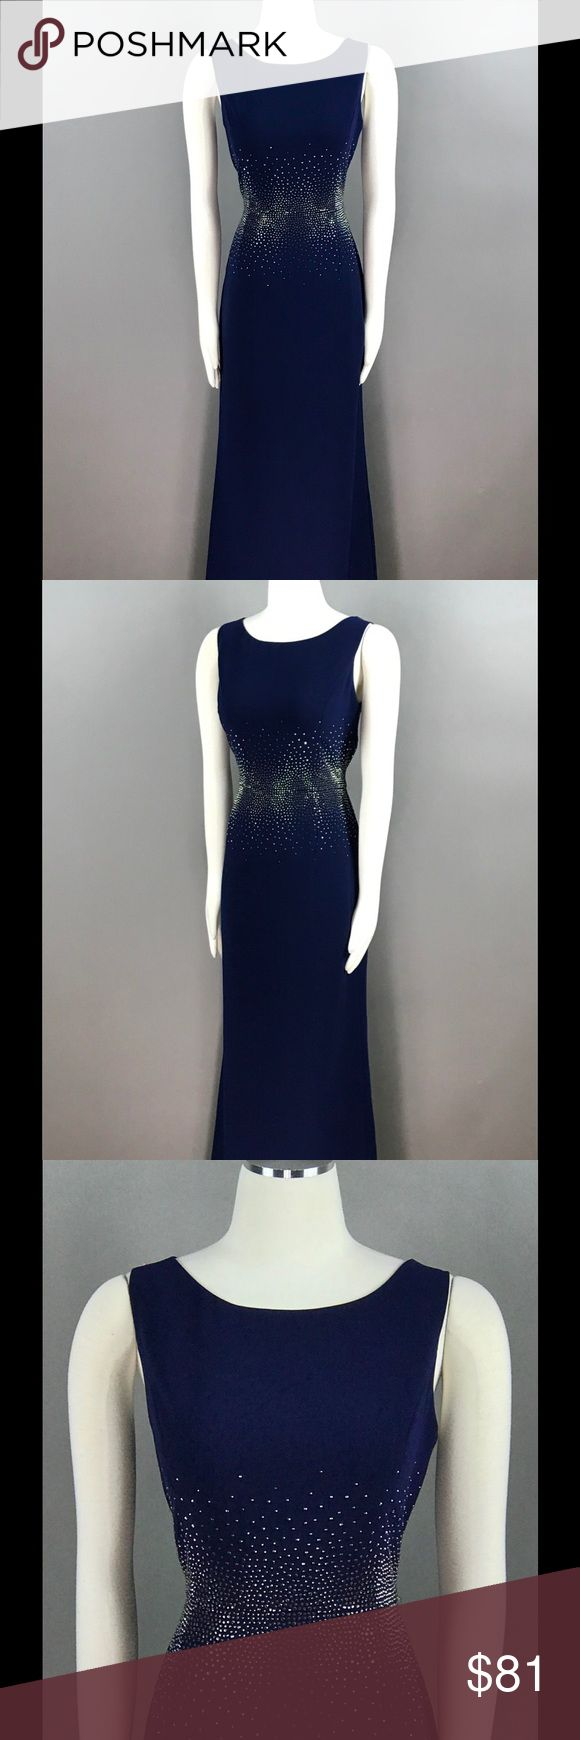 Calvin Klein Navy Maxi Dress Jewel Beaded NEW Calvin Klein Navy Twilight Evening Dress Size 10 Jewel Beaded Slit Back Lined $199 Gown NEW Calvin Klein Dresses Maxi